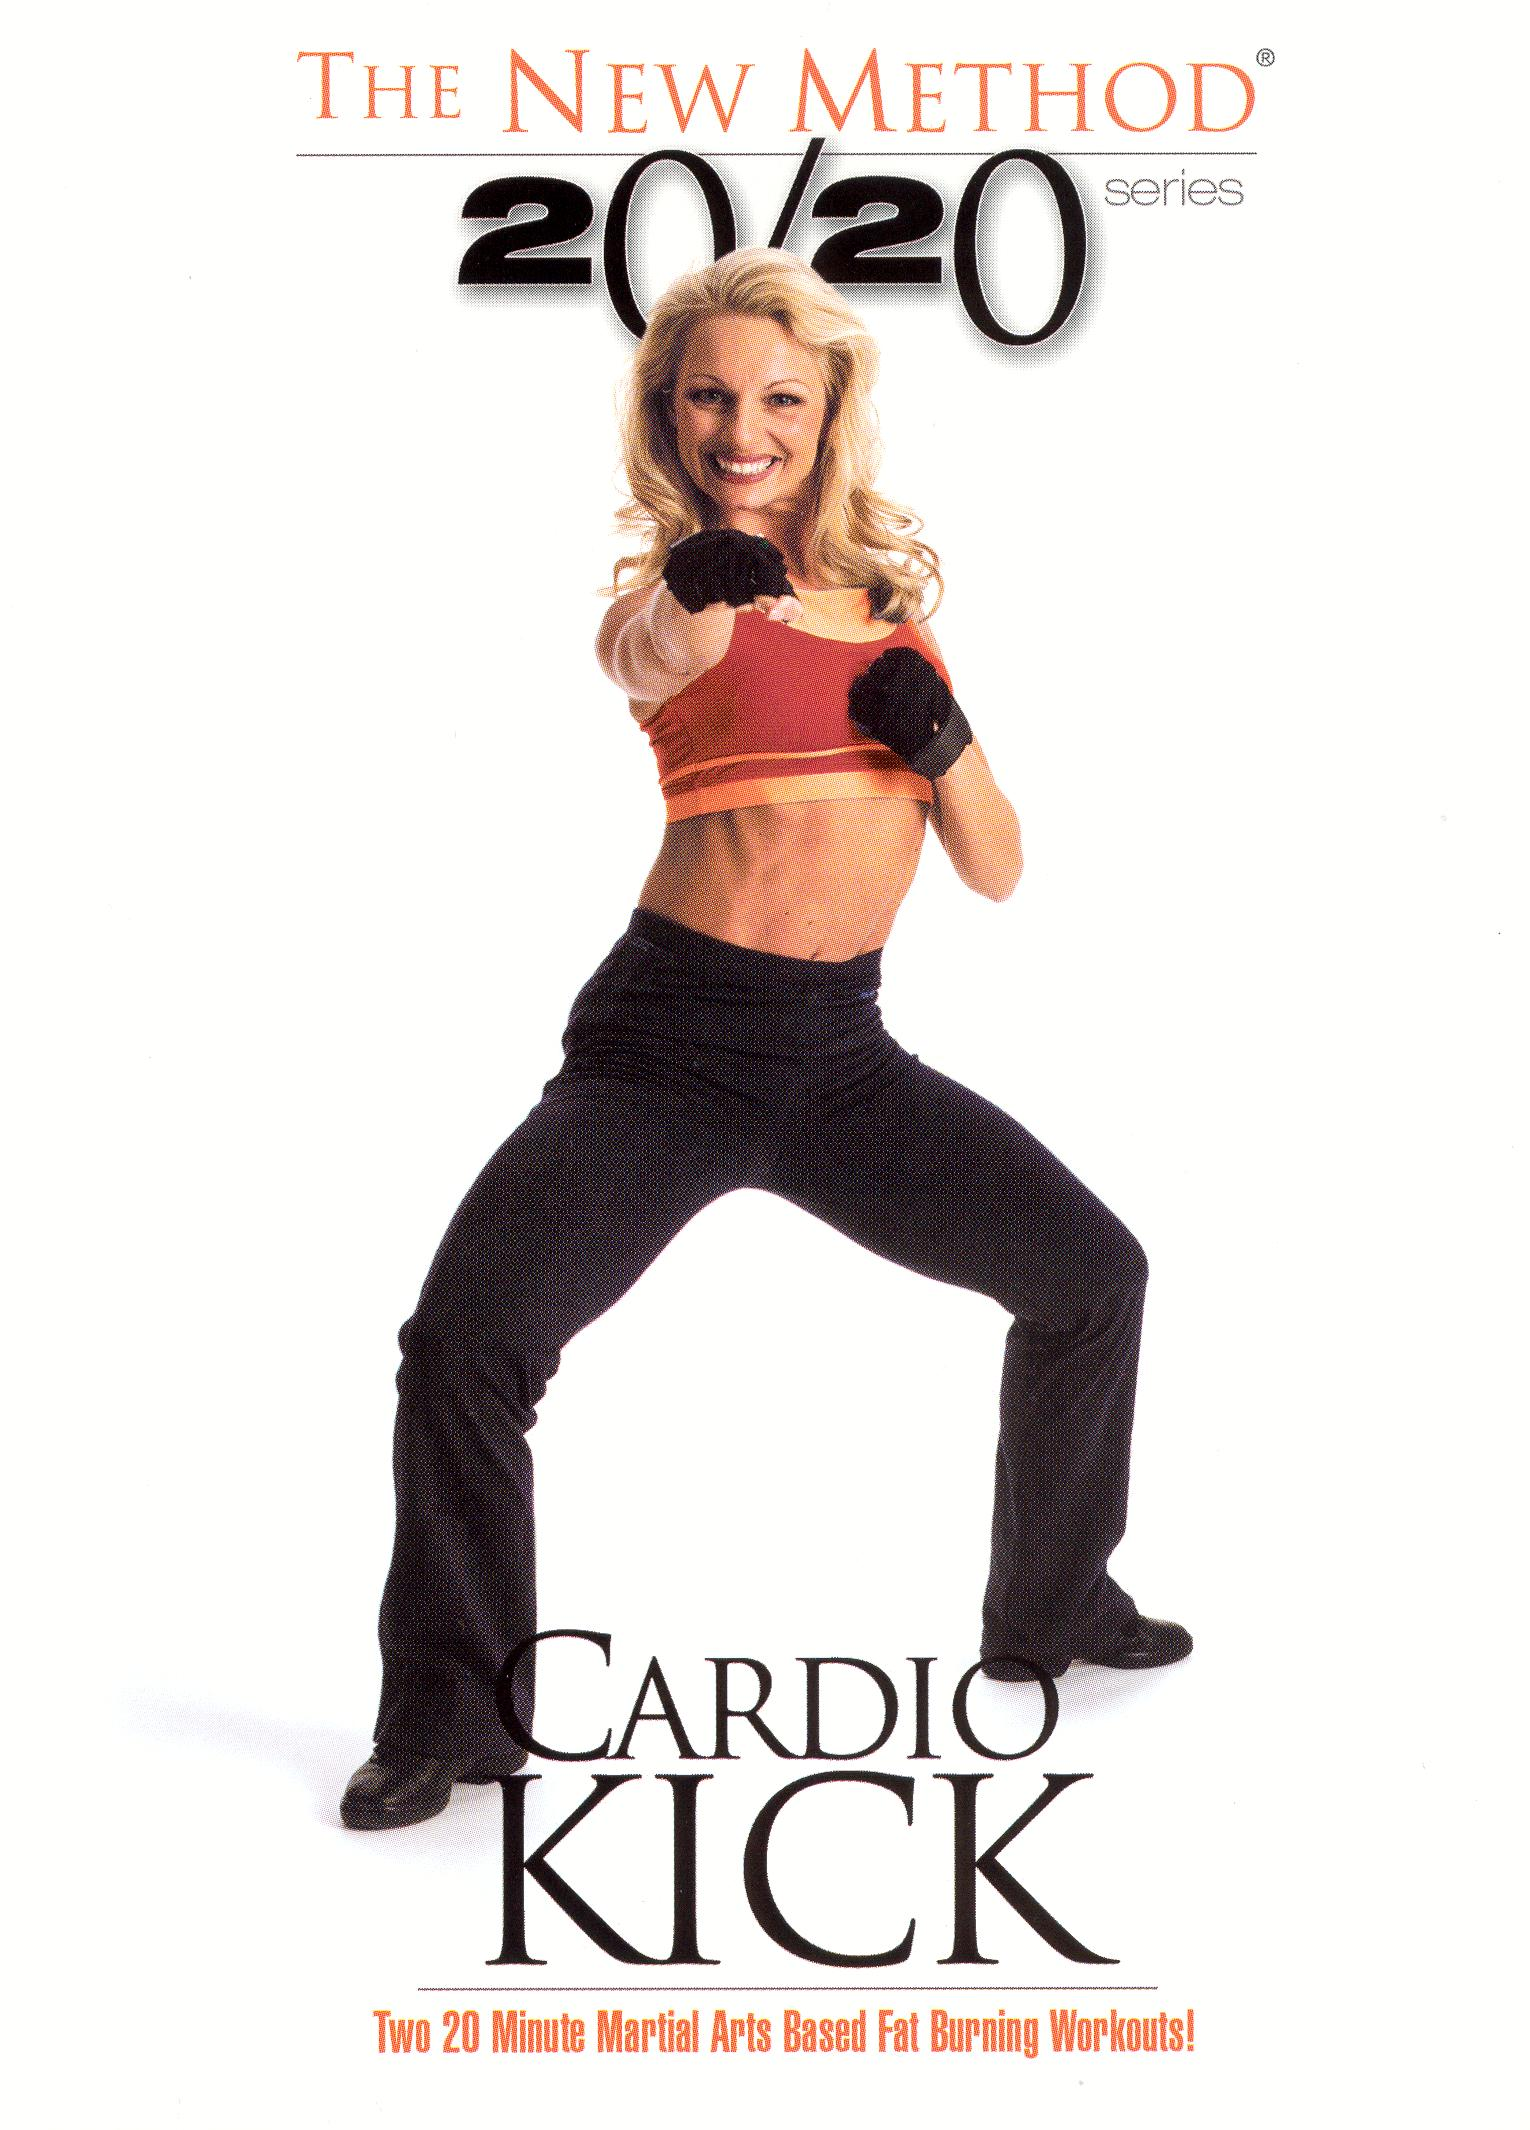 The New Method 20/20: Cardio Kick